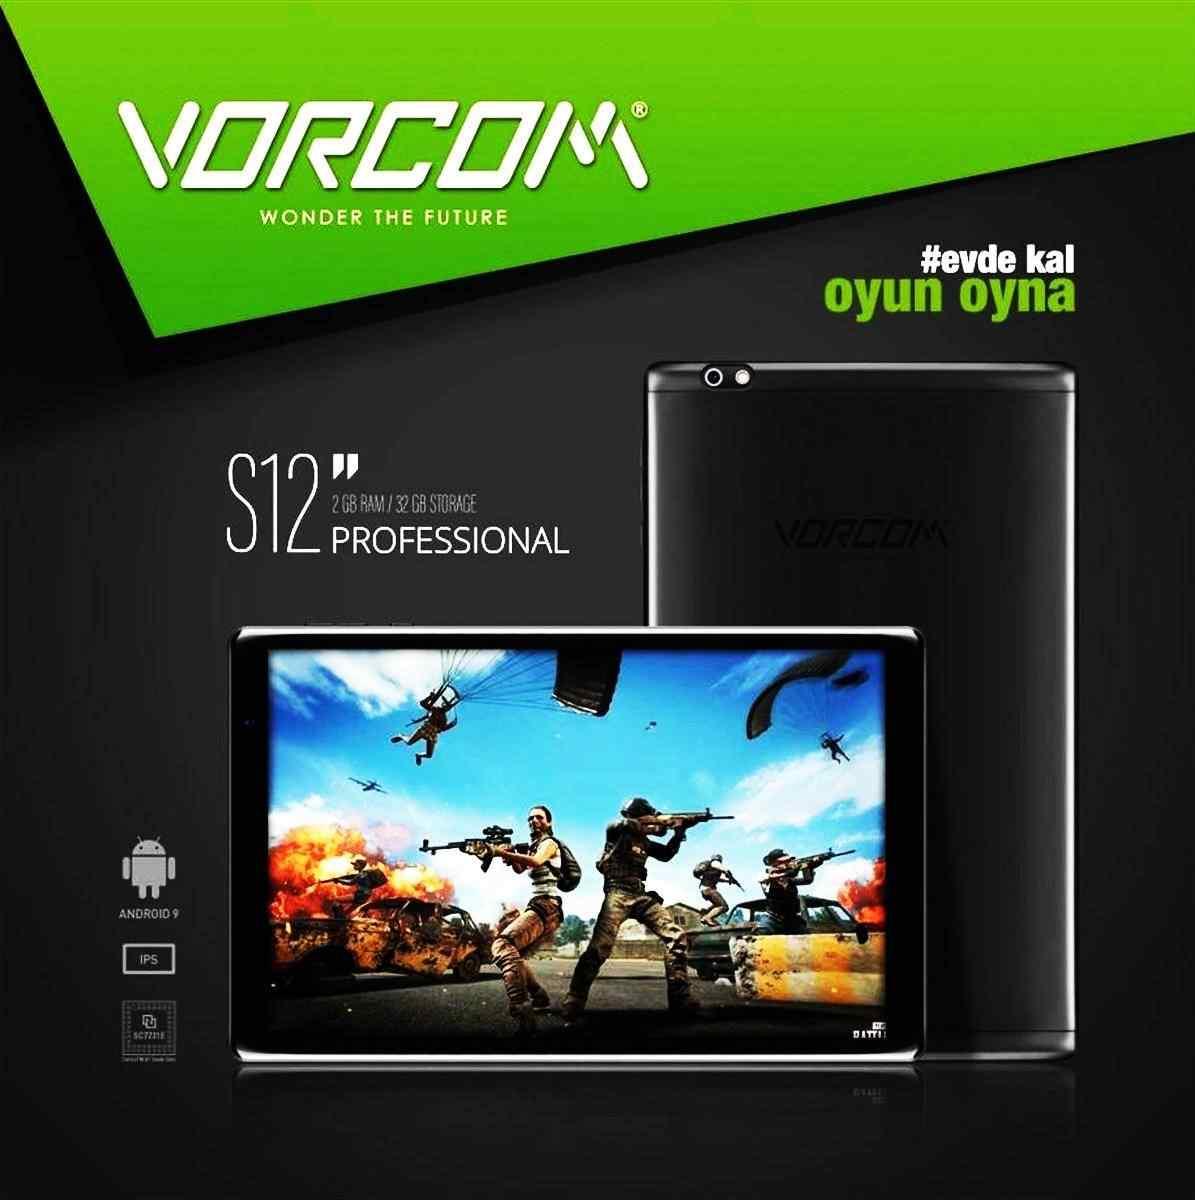 Vorcom S12 2 Gb 32 Gb 10.1 iPS Tablet Bilgisayar -Siyah